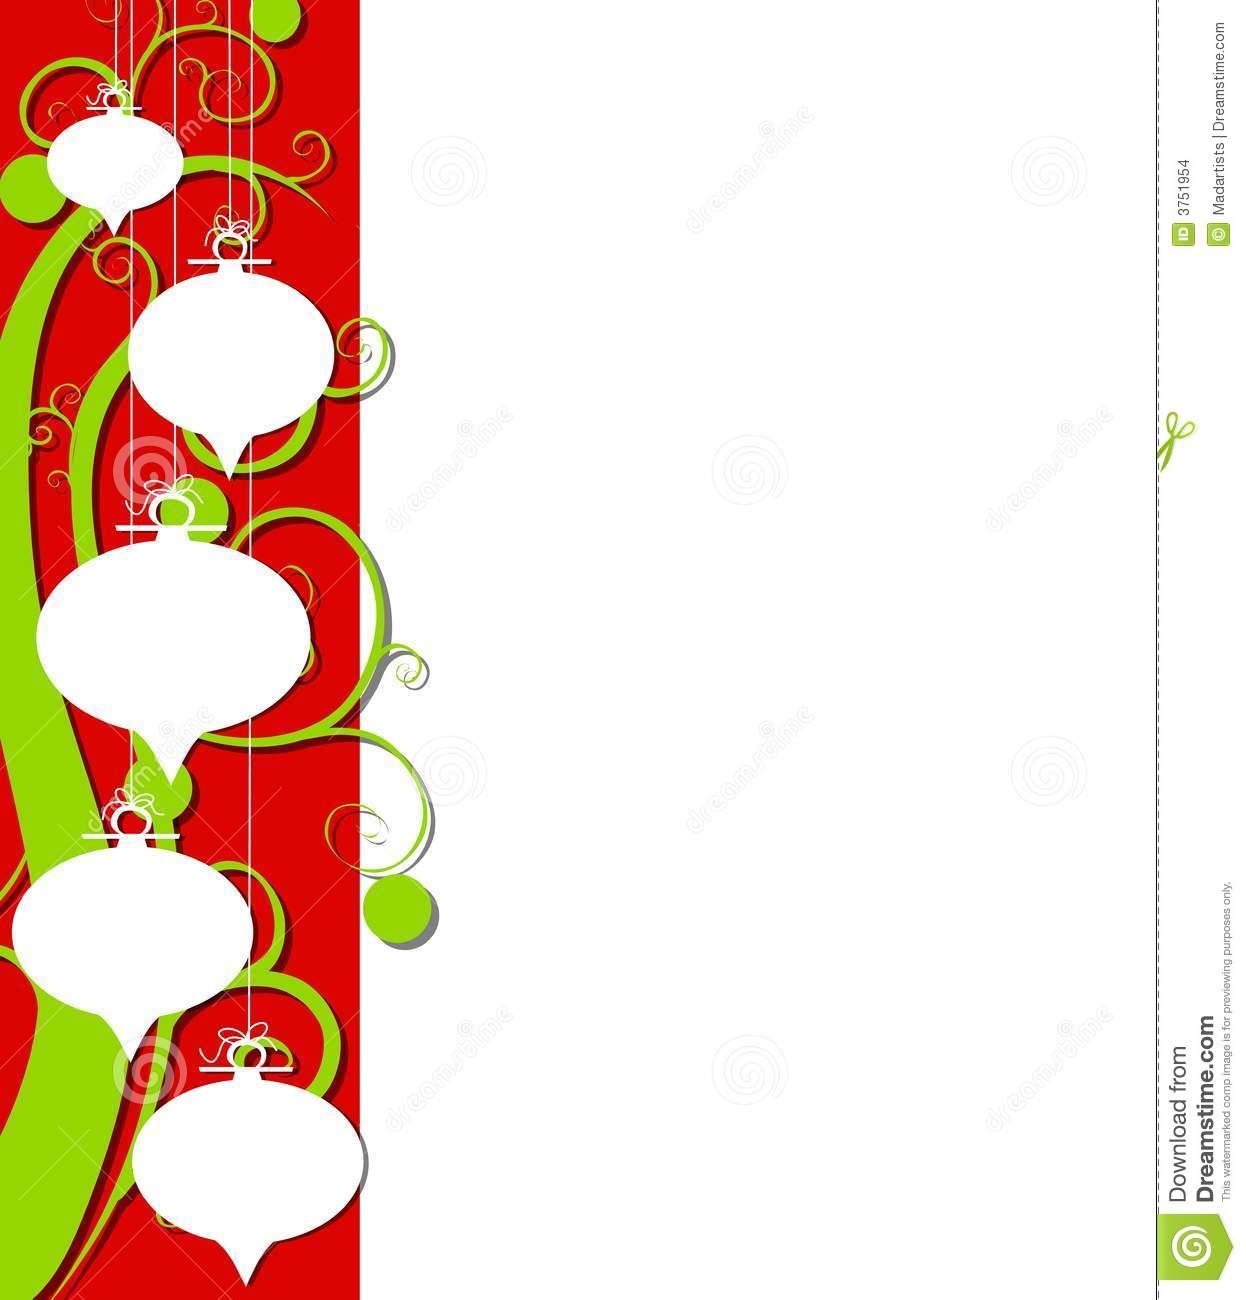 1246x1300 Christmas Ornaments Border Clip Art Christmas Ornaments